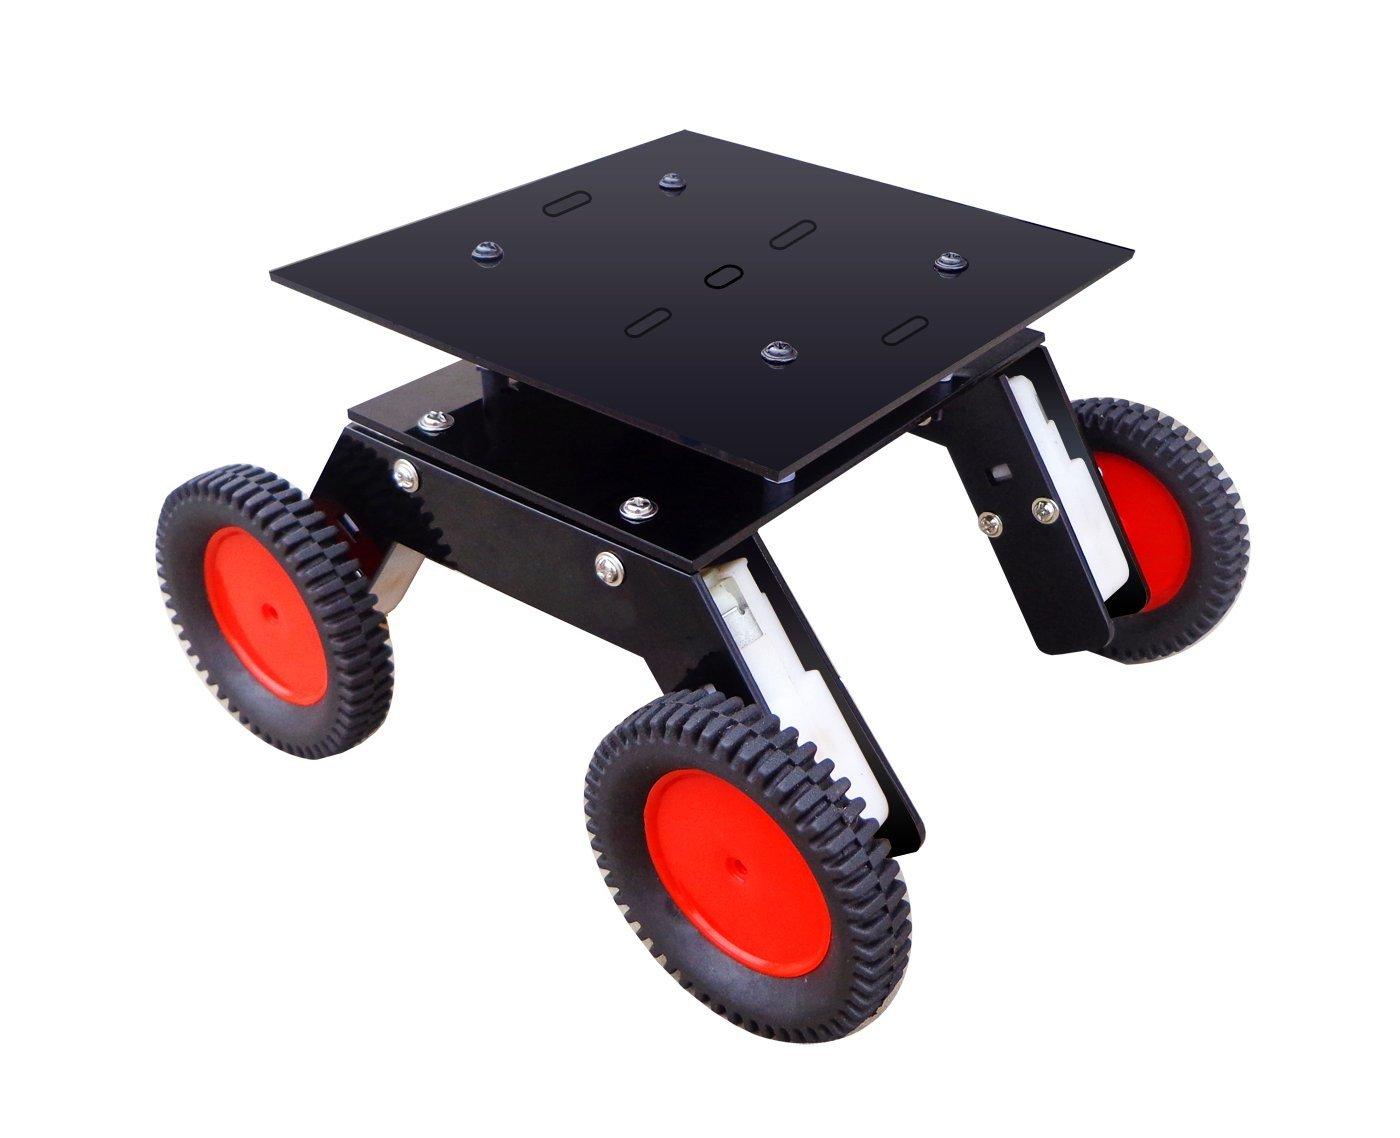 NASA Tech Multipurpose 4 Wheel Double Layer Robotic Chassis B01KTHX9OW